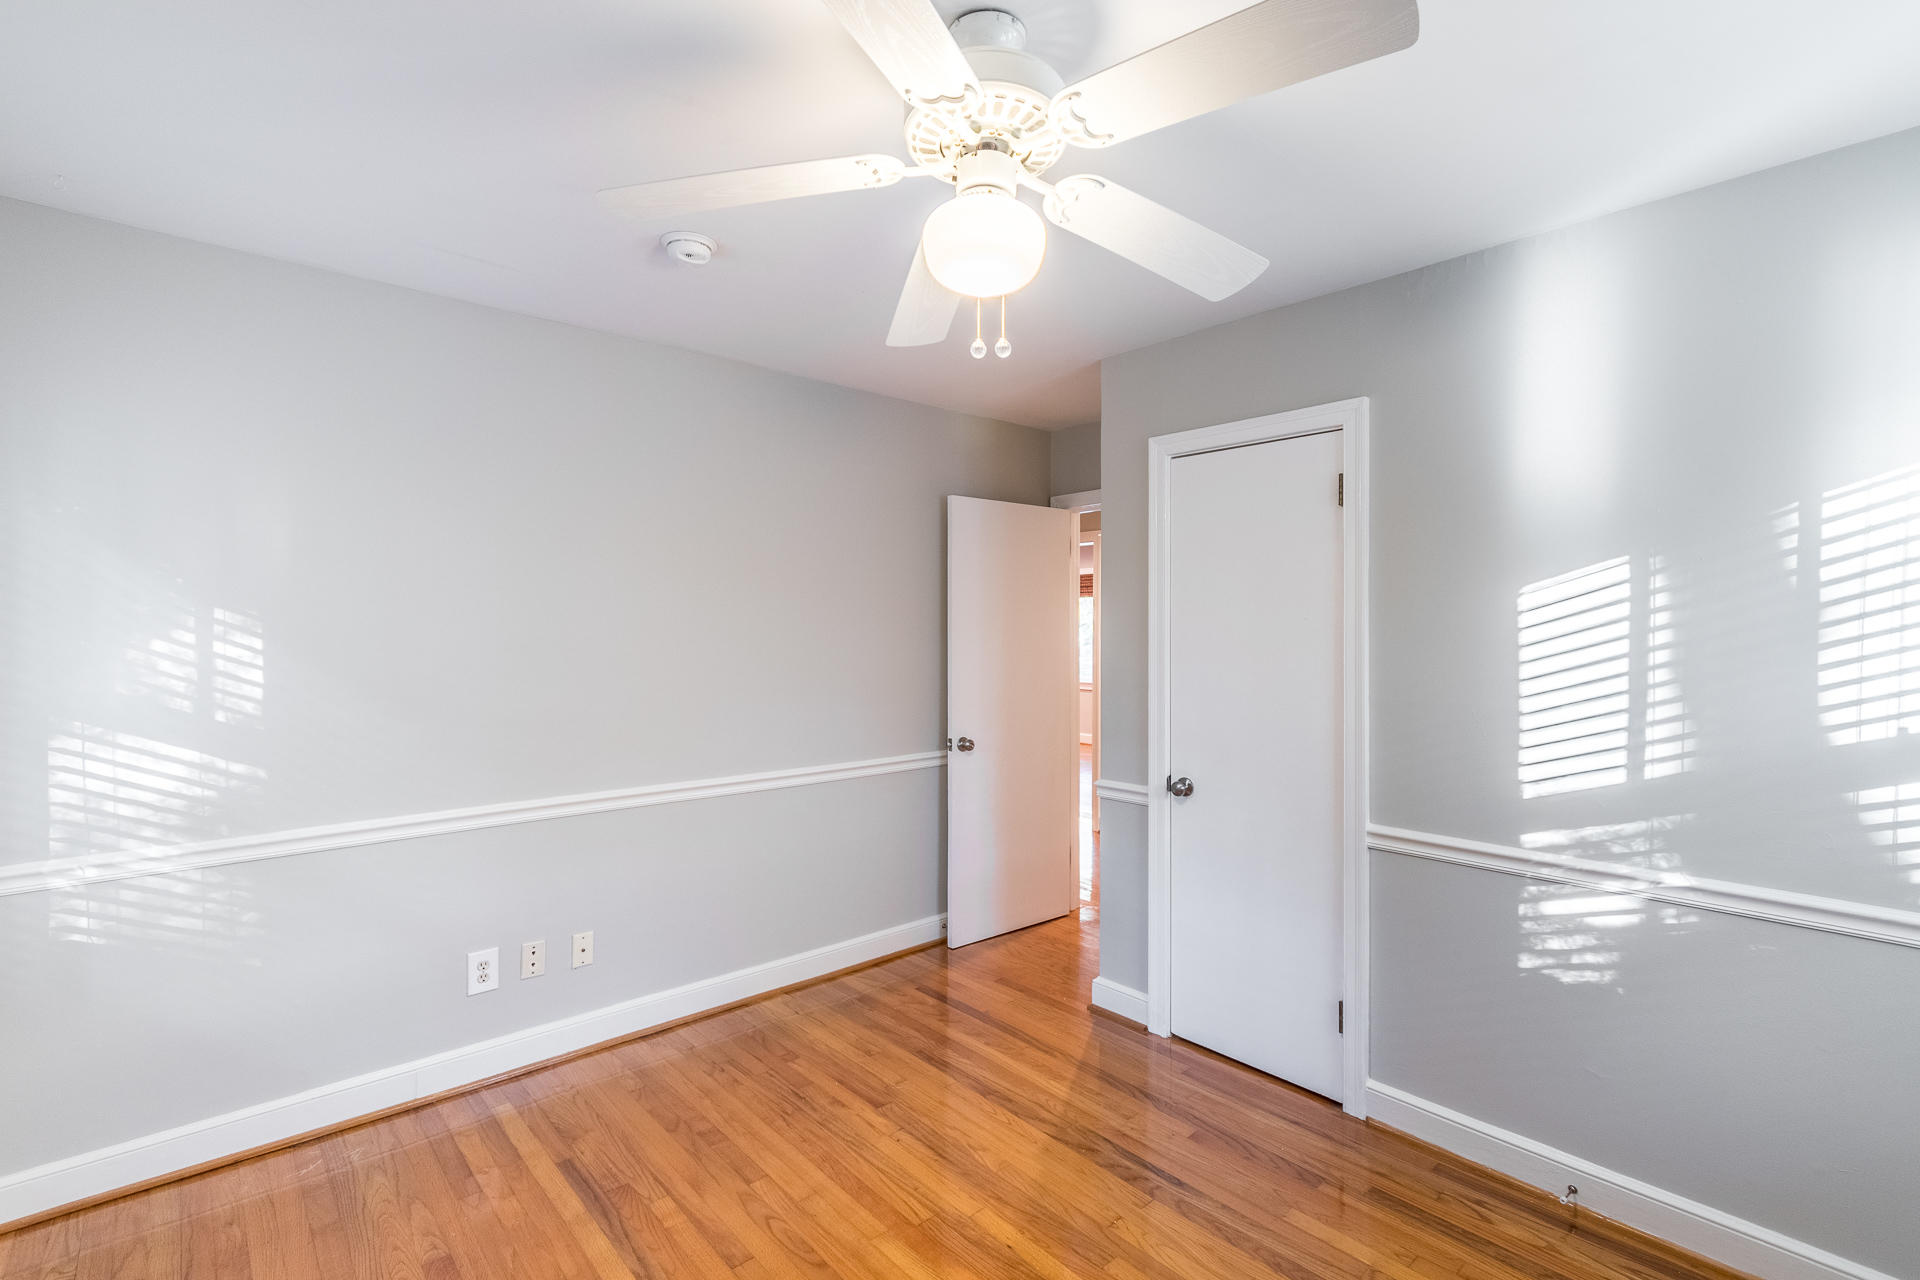 Edgewood Gardens Homes For Sale - 507 Risher, Charleston, SC - 22